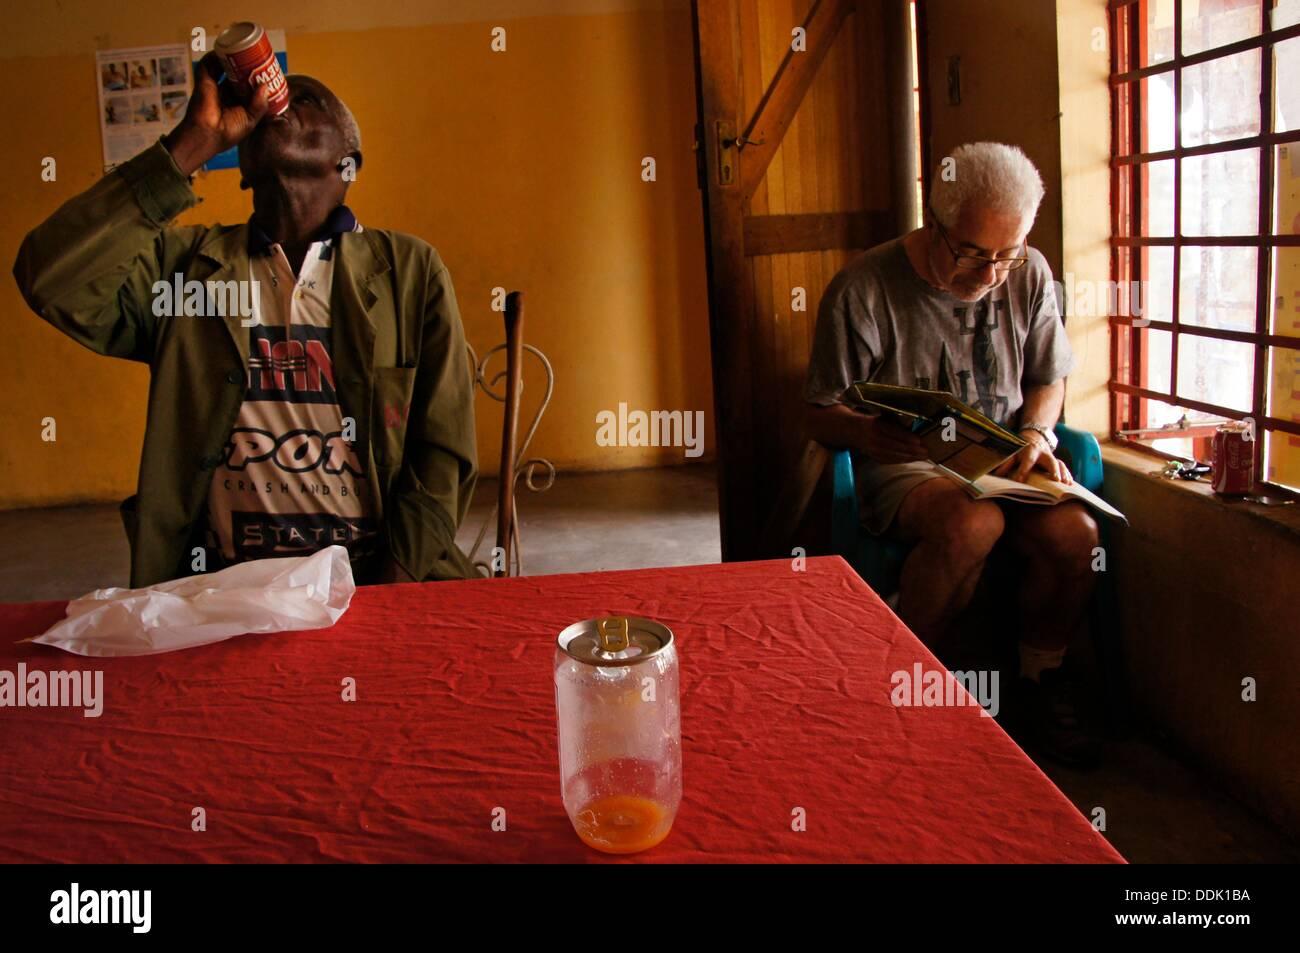 Beer, tourism and Africa, Gweta, Botswana - Stock Image